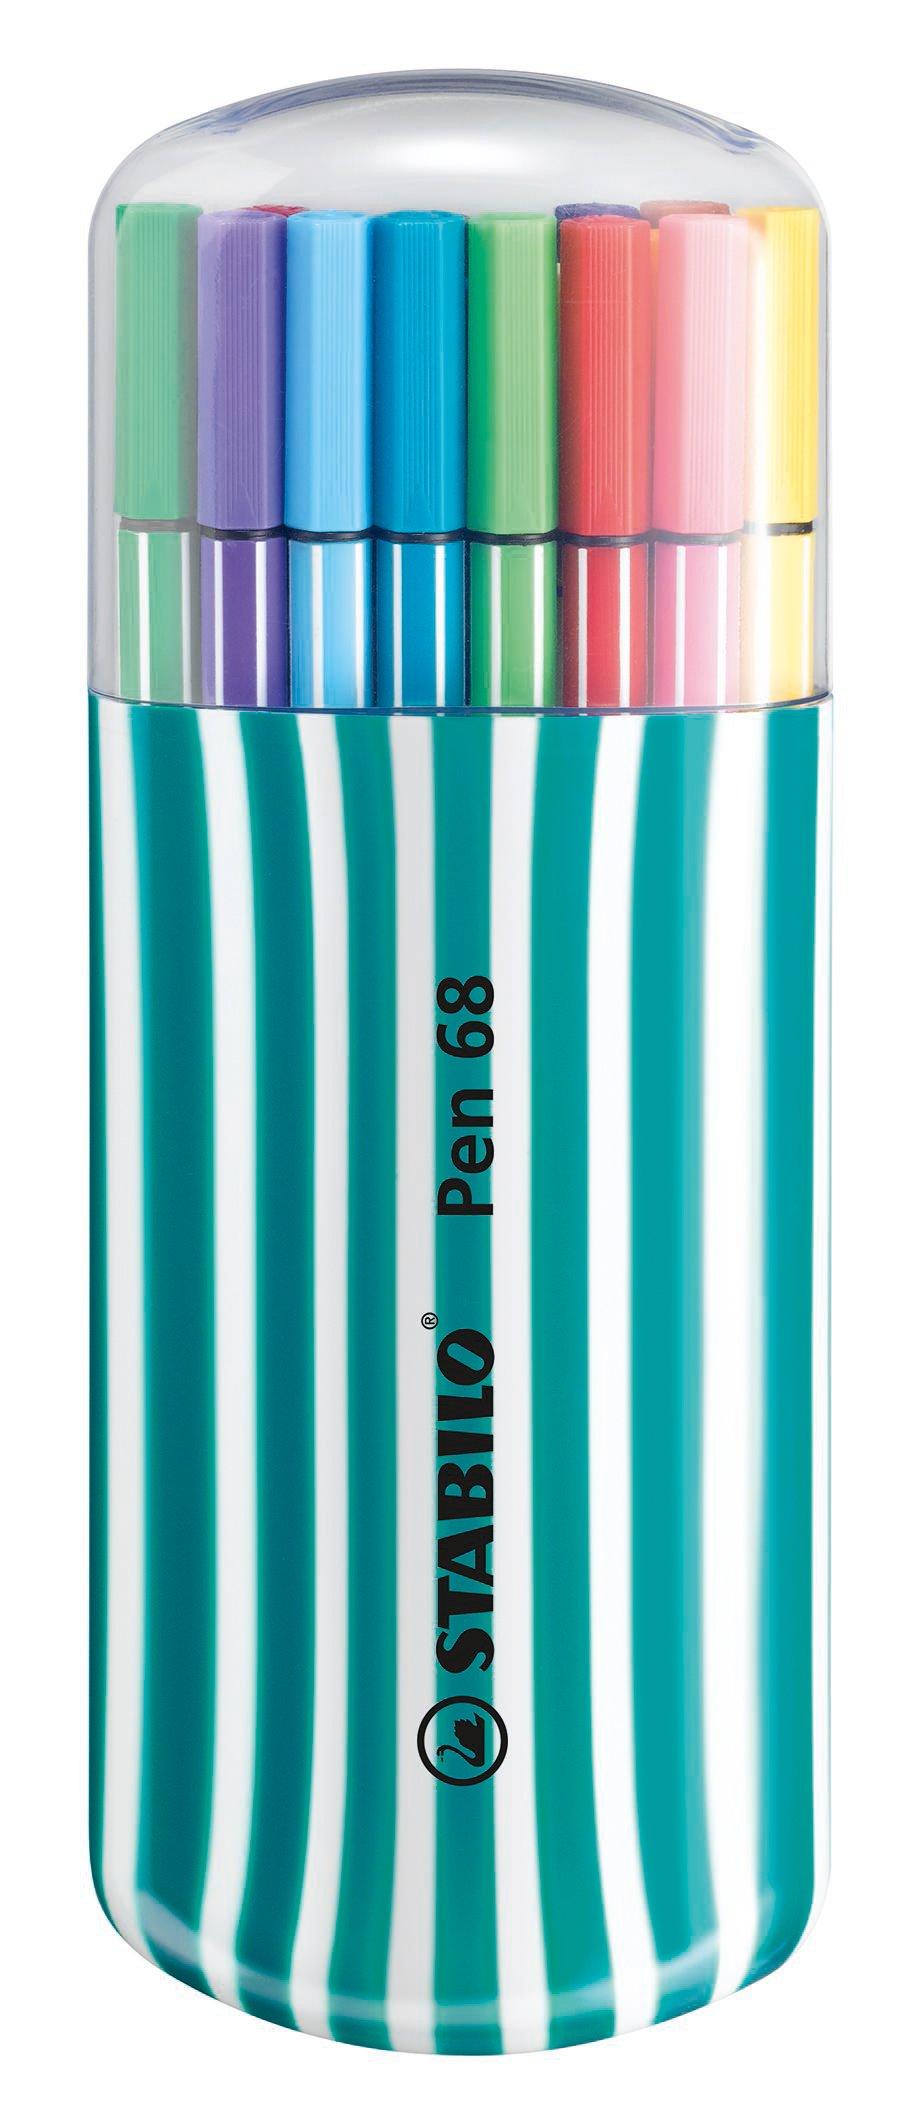 Rotulador STABILO Pen 68 – Estuche premium Zebrui con 20 colores